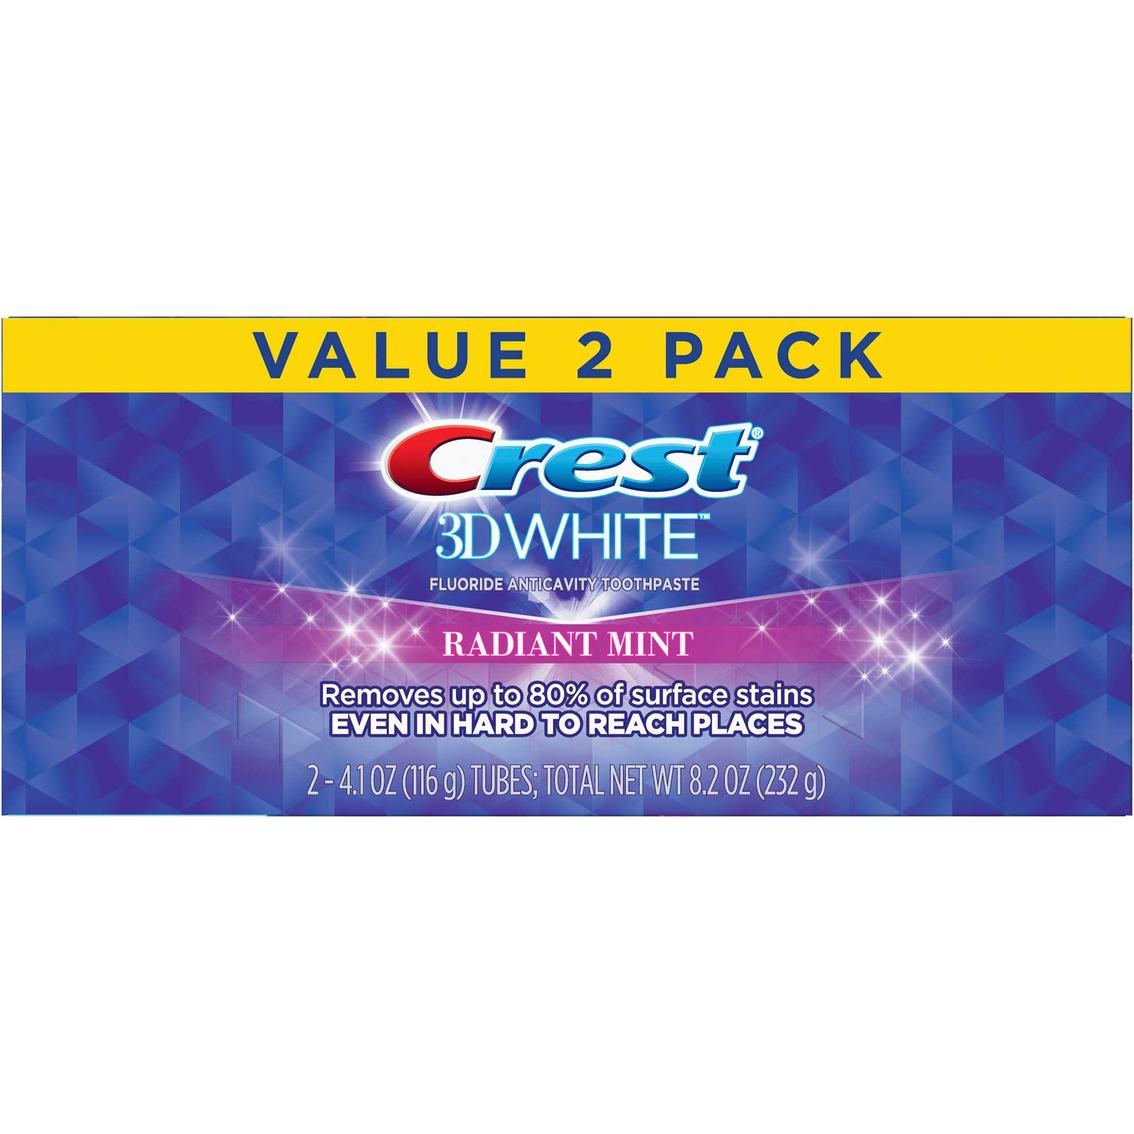 Crest 3d White Whitening Toothpaste Radiant Mint 4 1oz 2ct